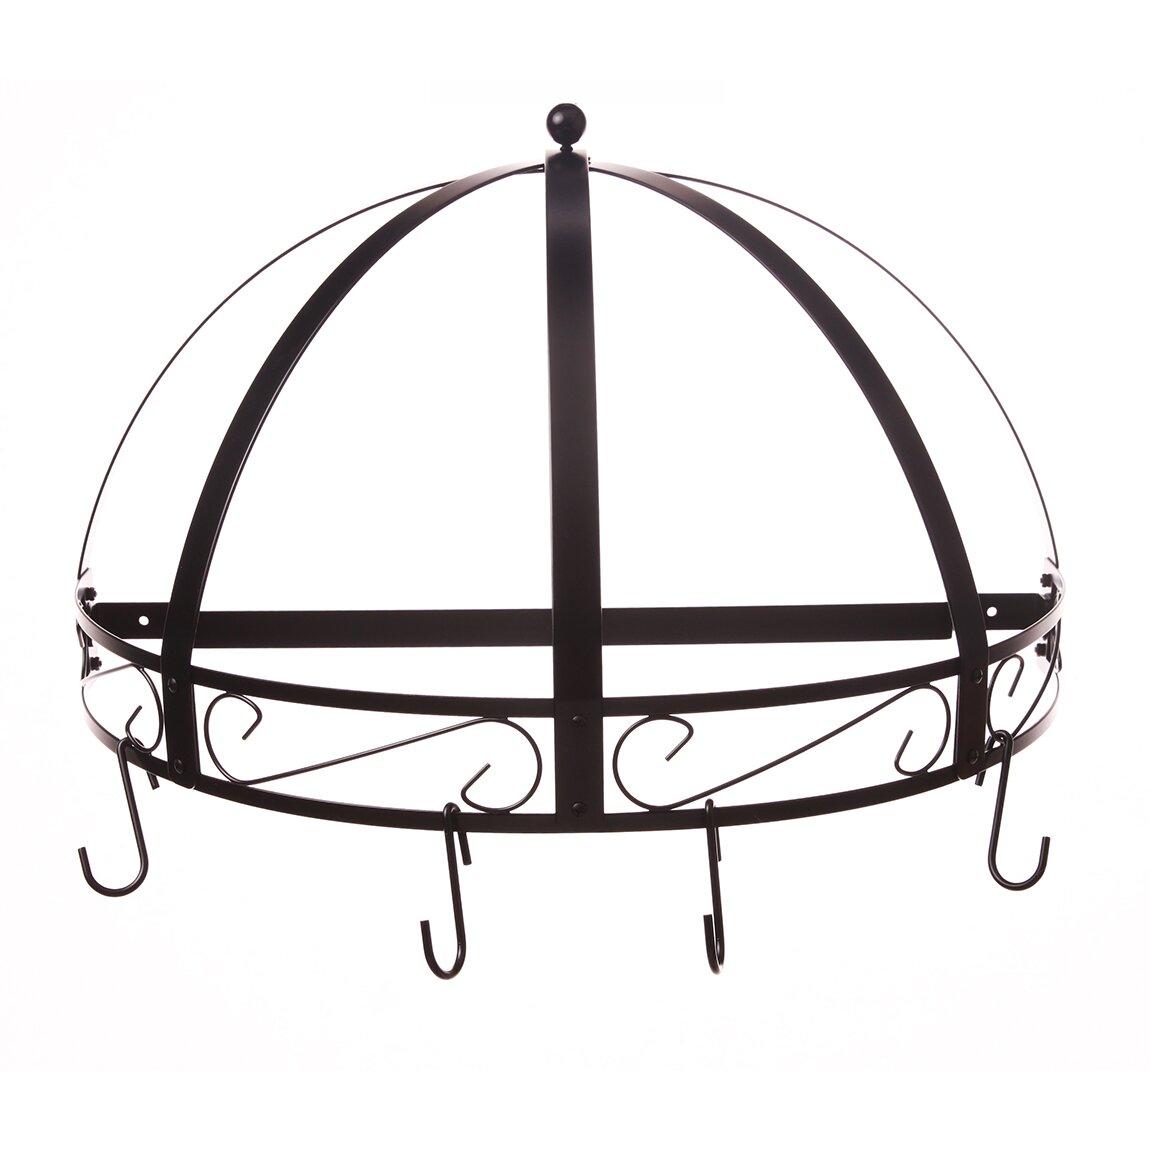 kinetic classicor series wrought iron semicircle pot rack reviews wayfair